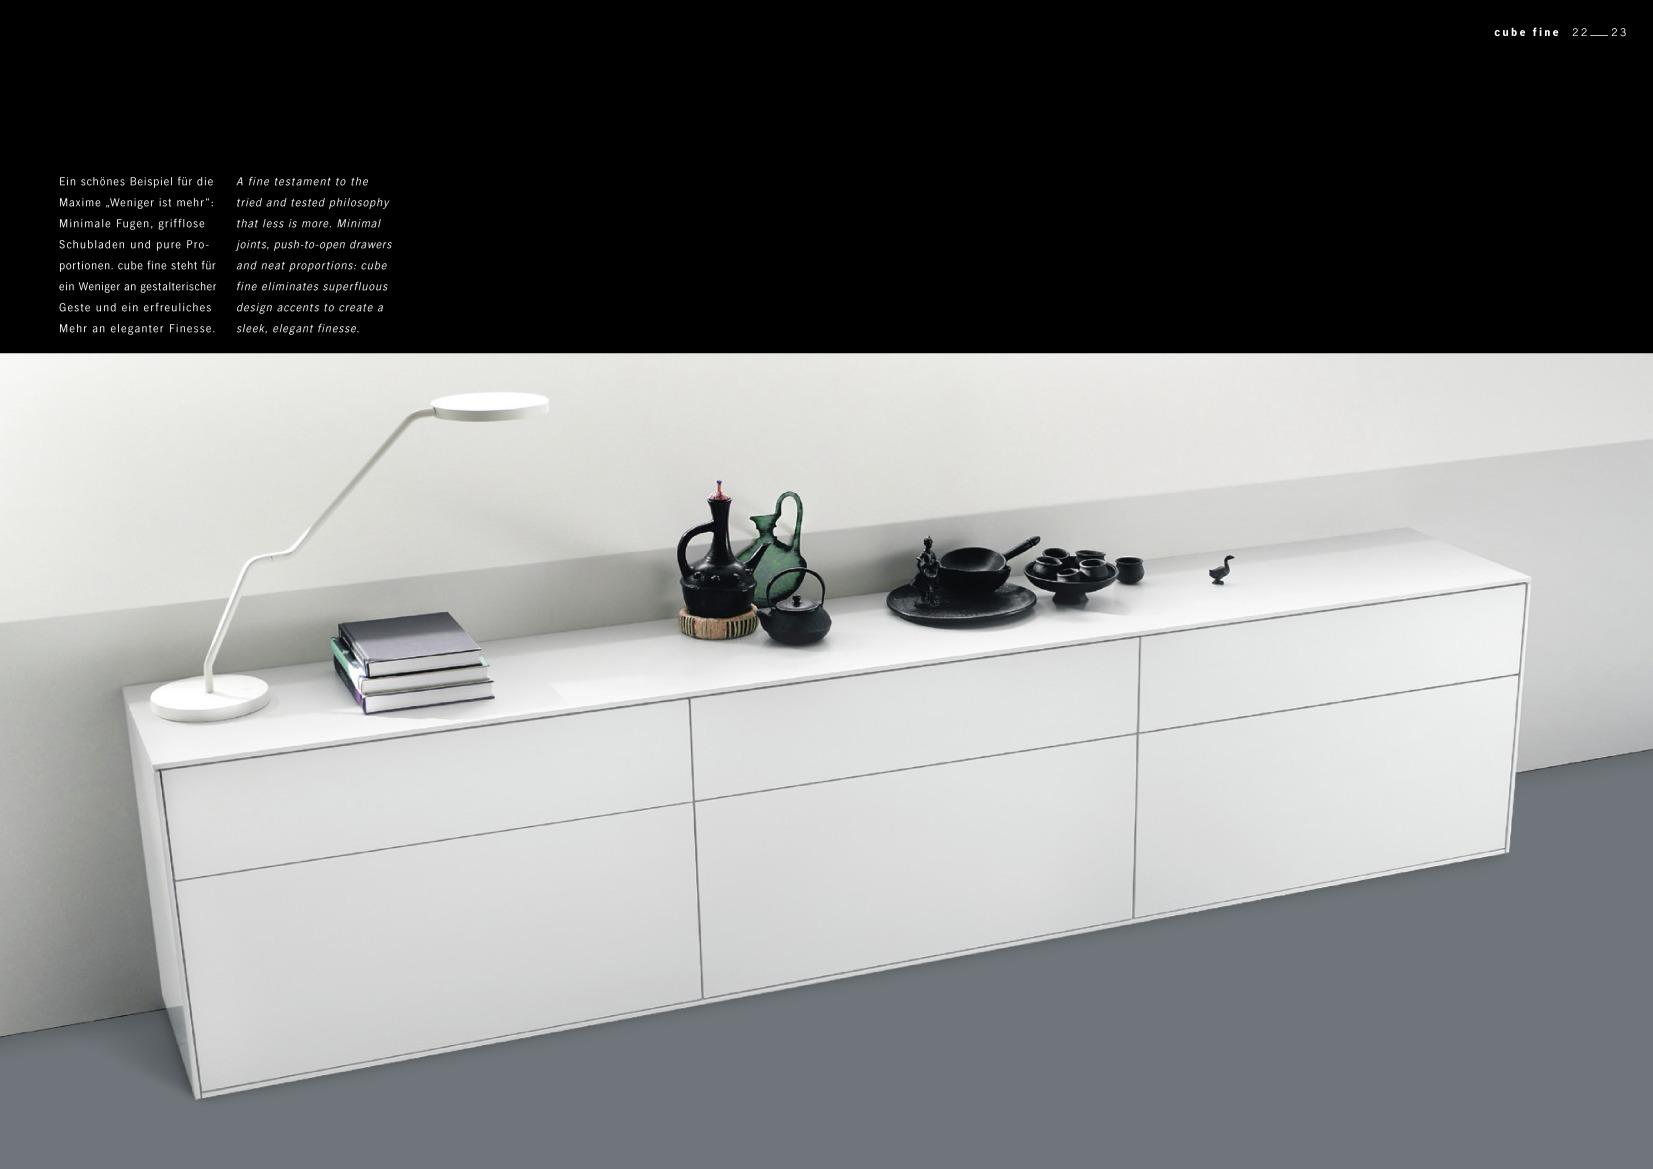 interluebke lookbook 2017 gs 10 m bel weber neustadt landau karlsruhe. Black Bedroom Furniture Sets. Home Design Ideas